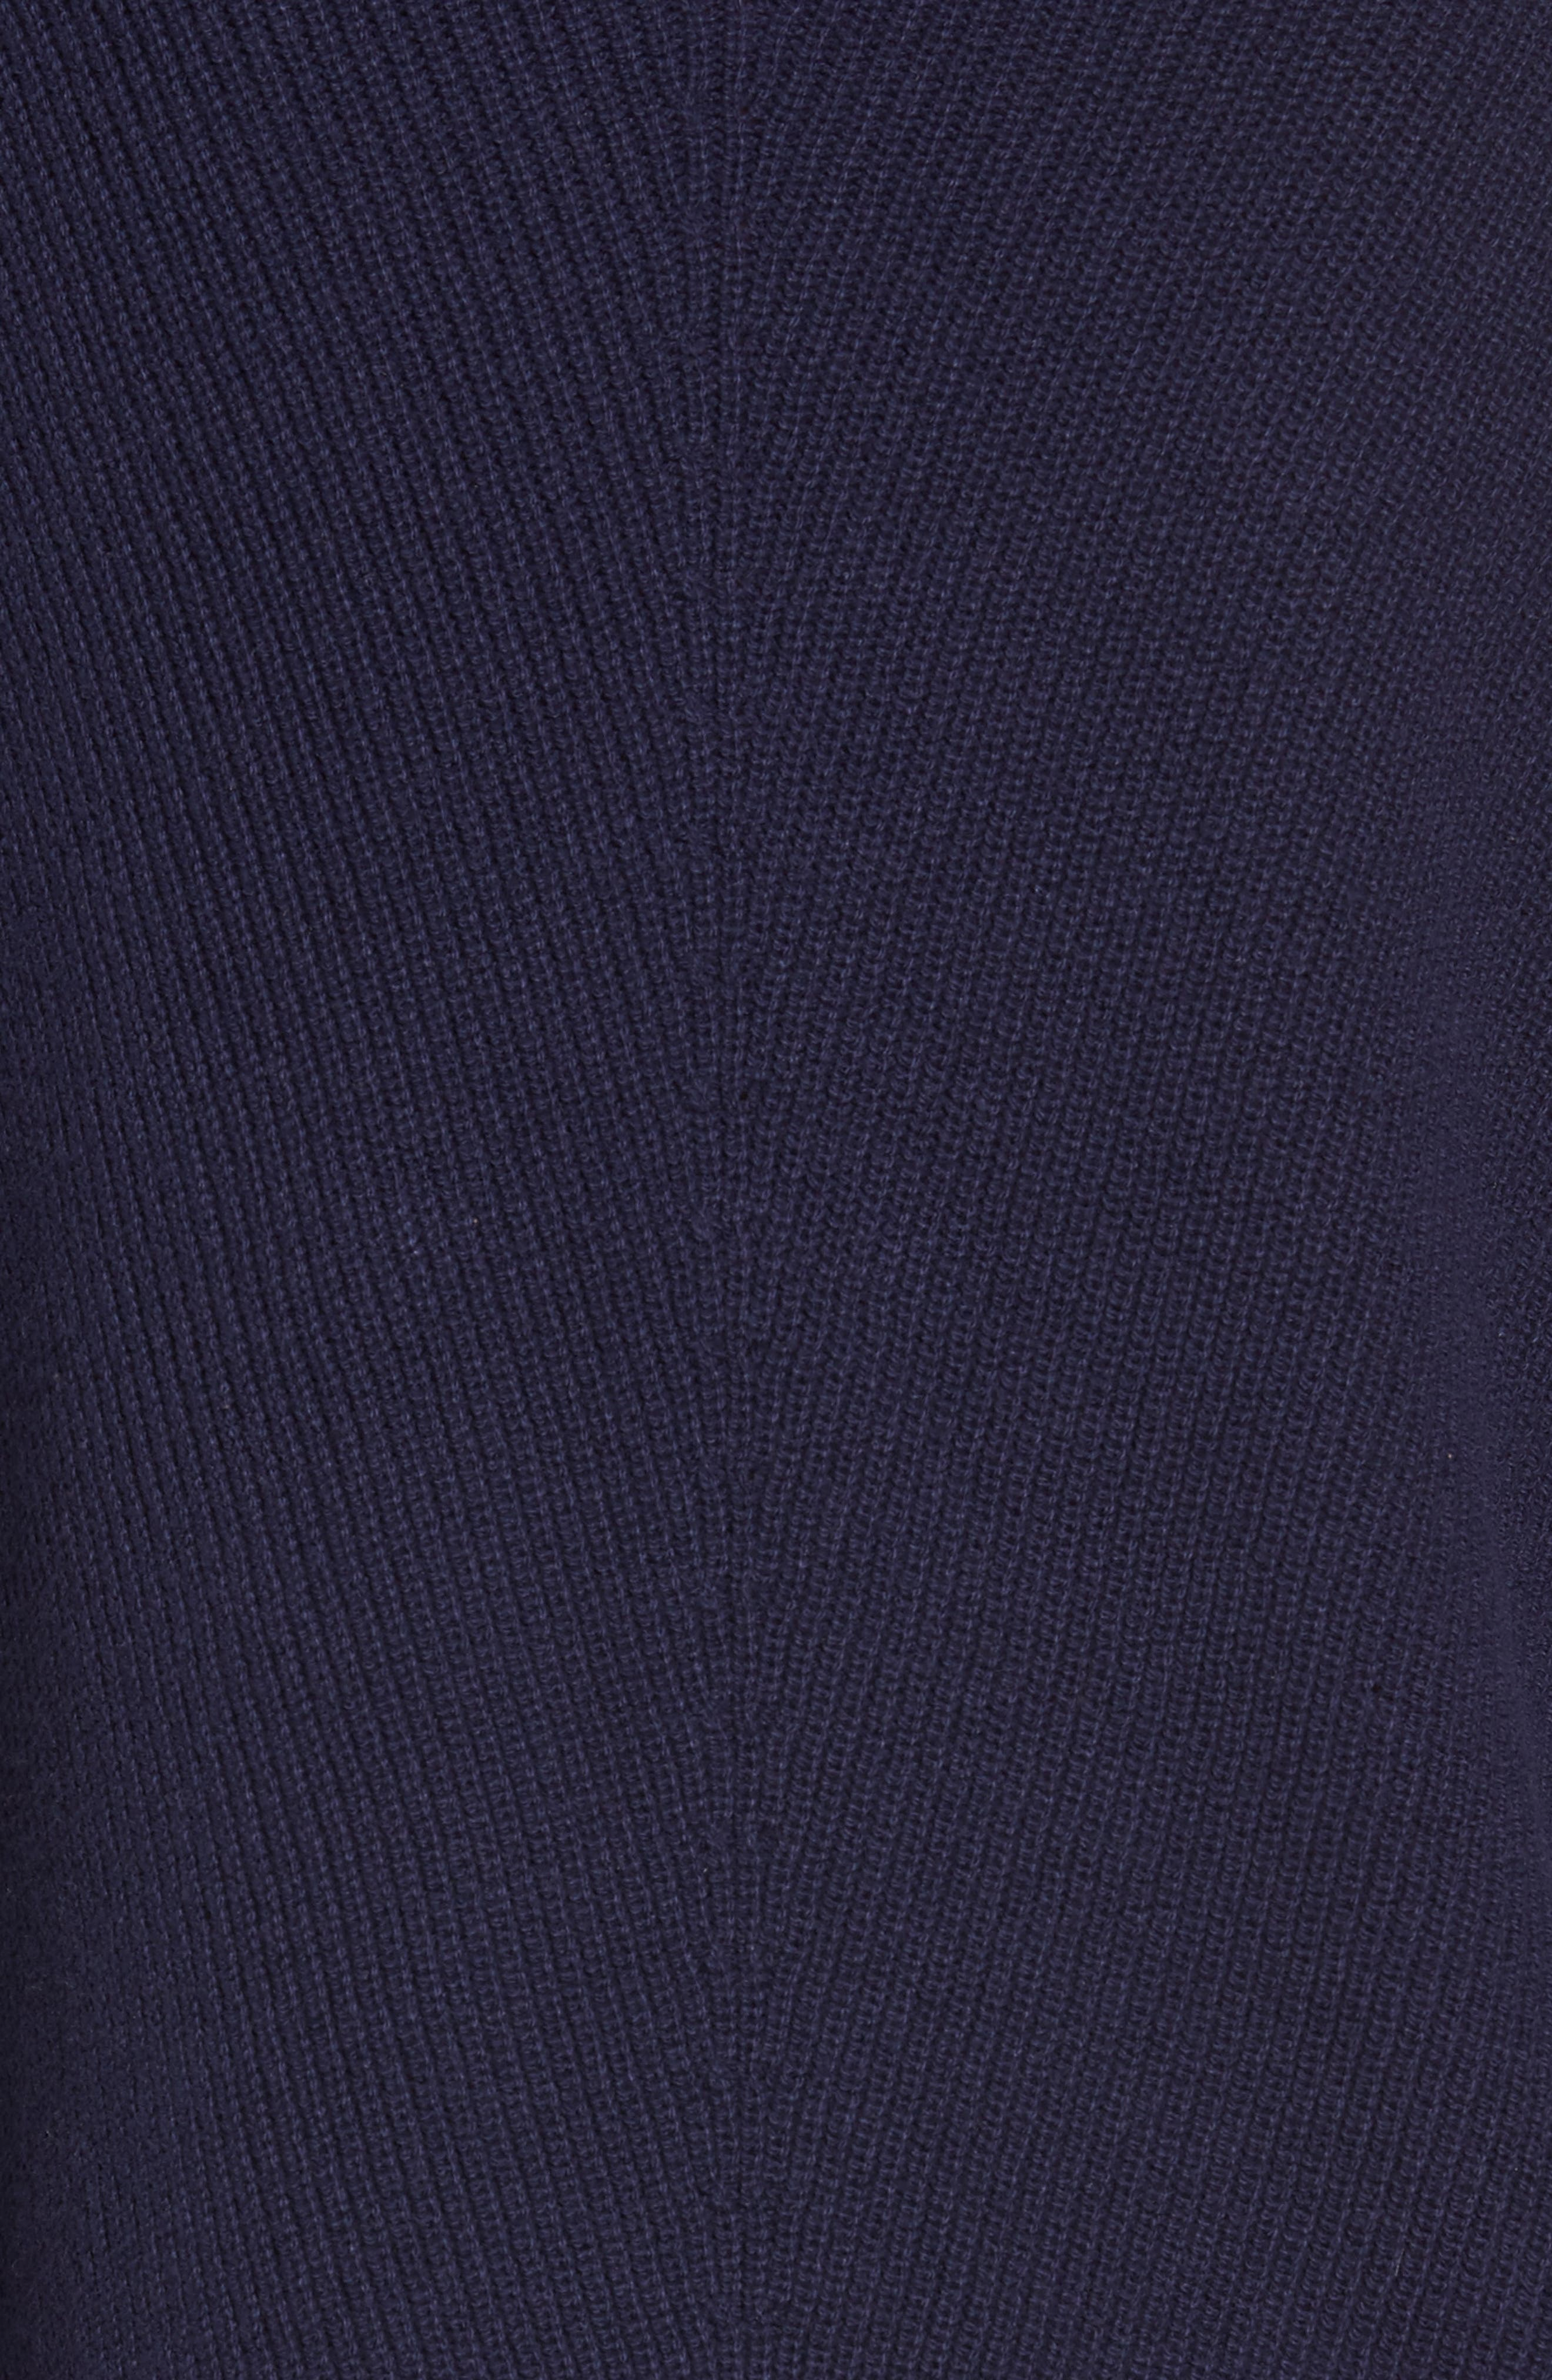 Ribbed Asymmetrical Hem Sweater,                             Alternate thumbnail 5, color,                             429